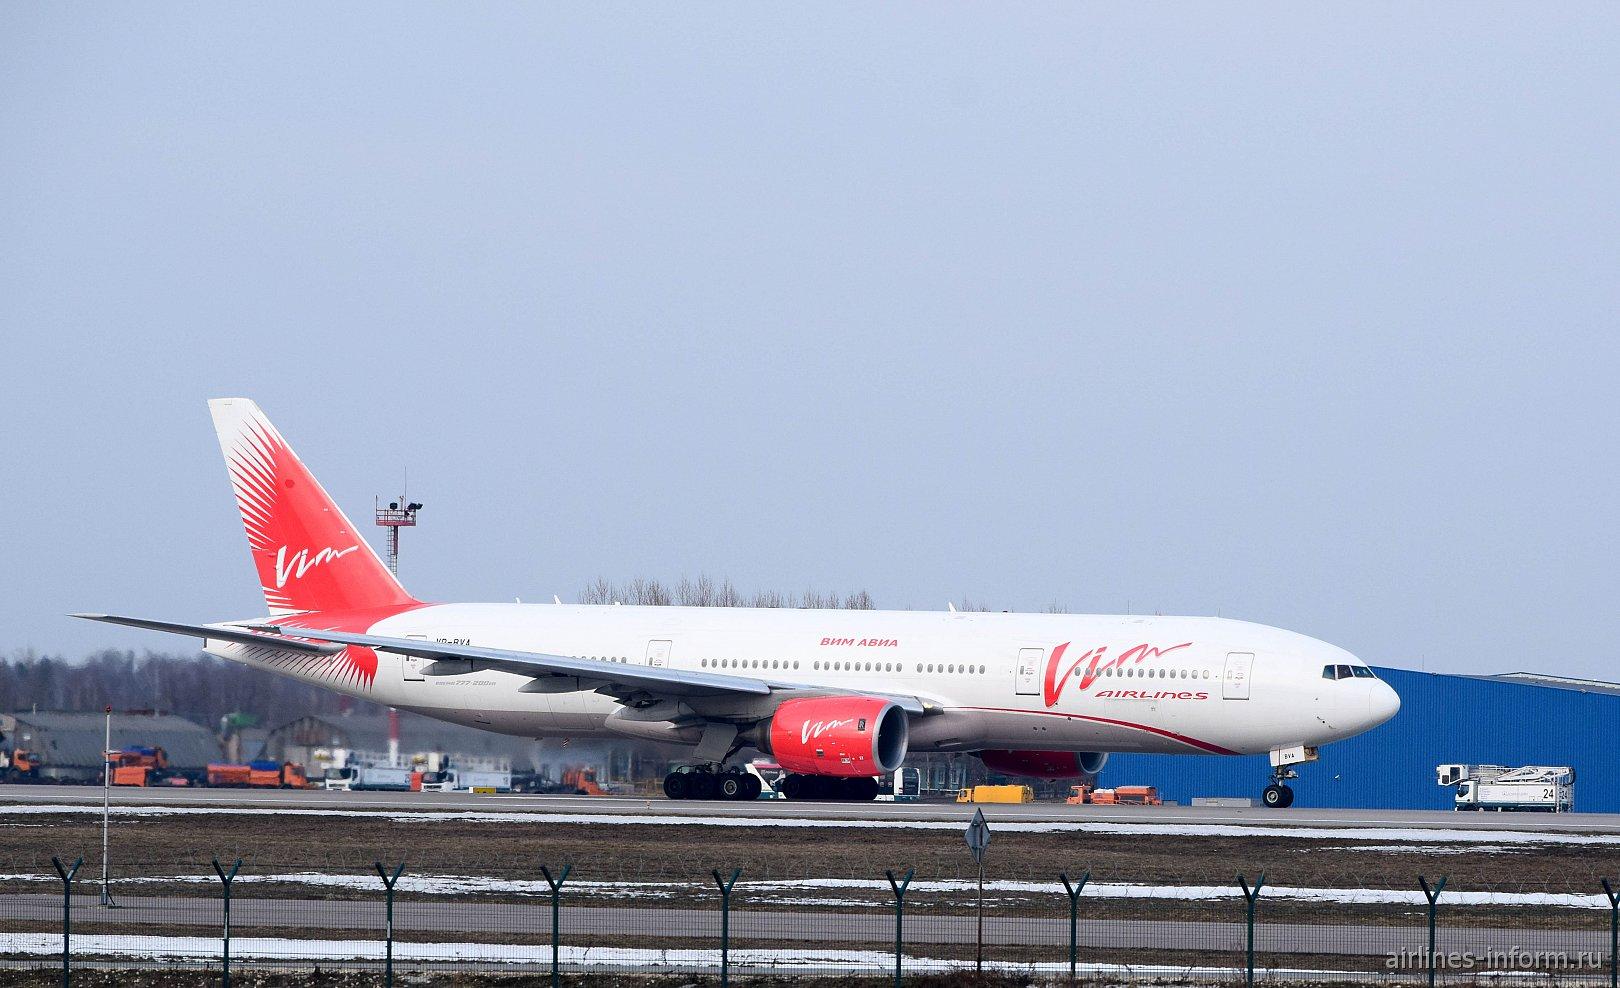 Боинг-777-200 авиакомпании ВИМ-авиа в аэропорту Домодедово